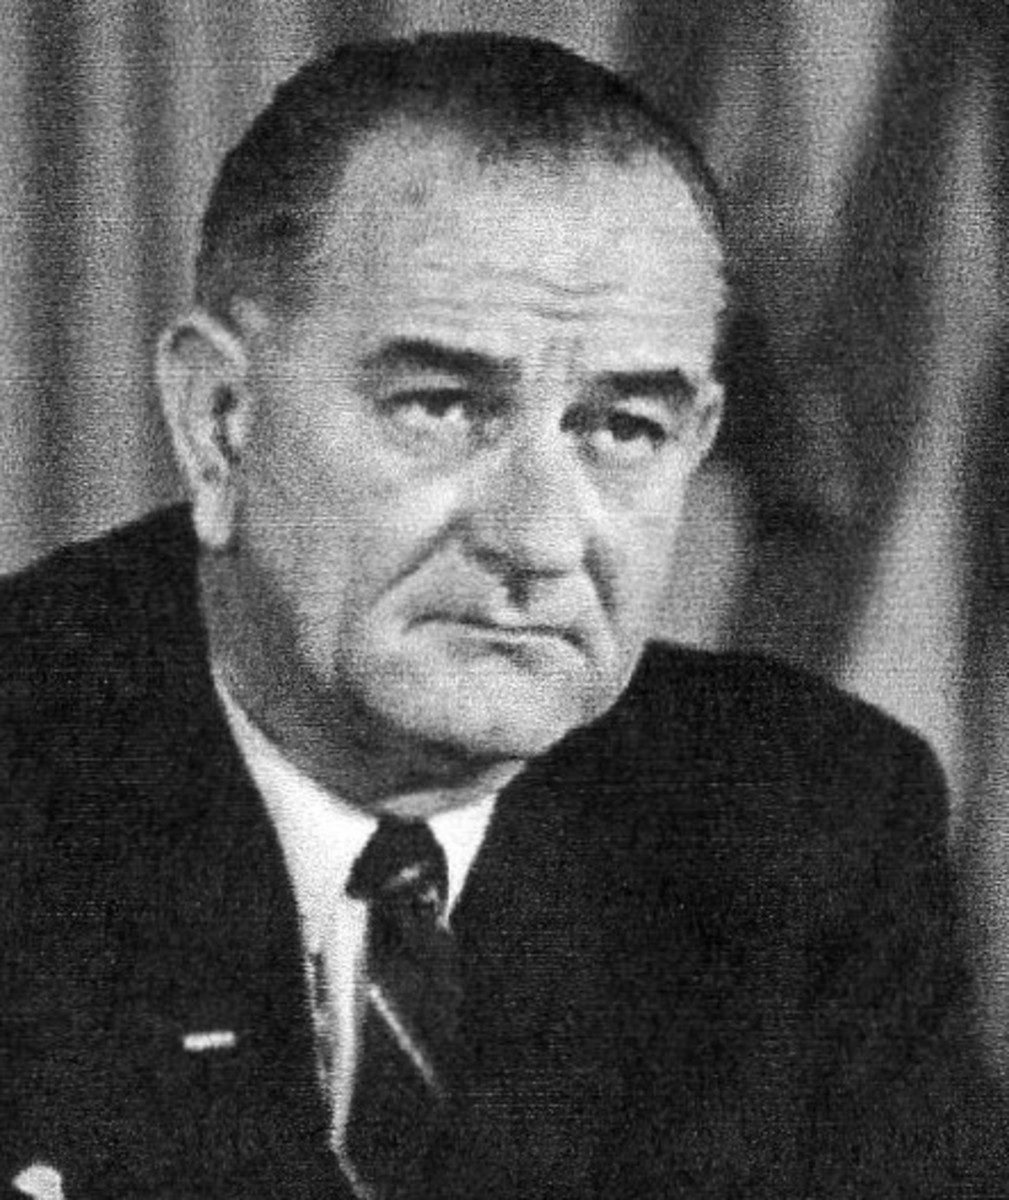 Lyndon B. Johnson, the thirty-sixth president, a Democrat from Texas, 1963-1969.